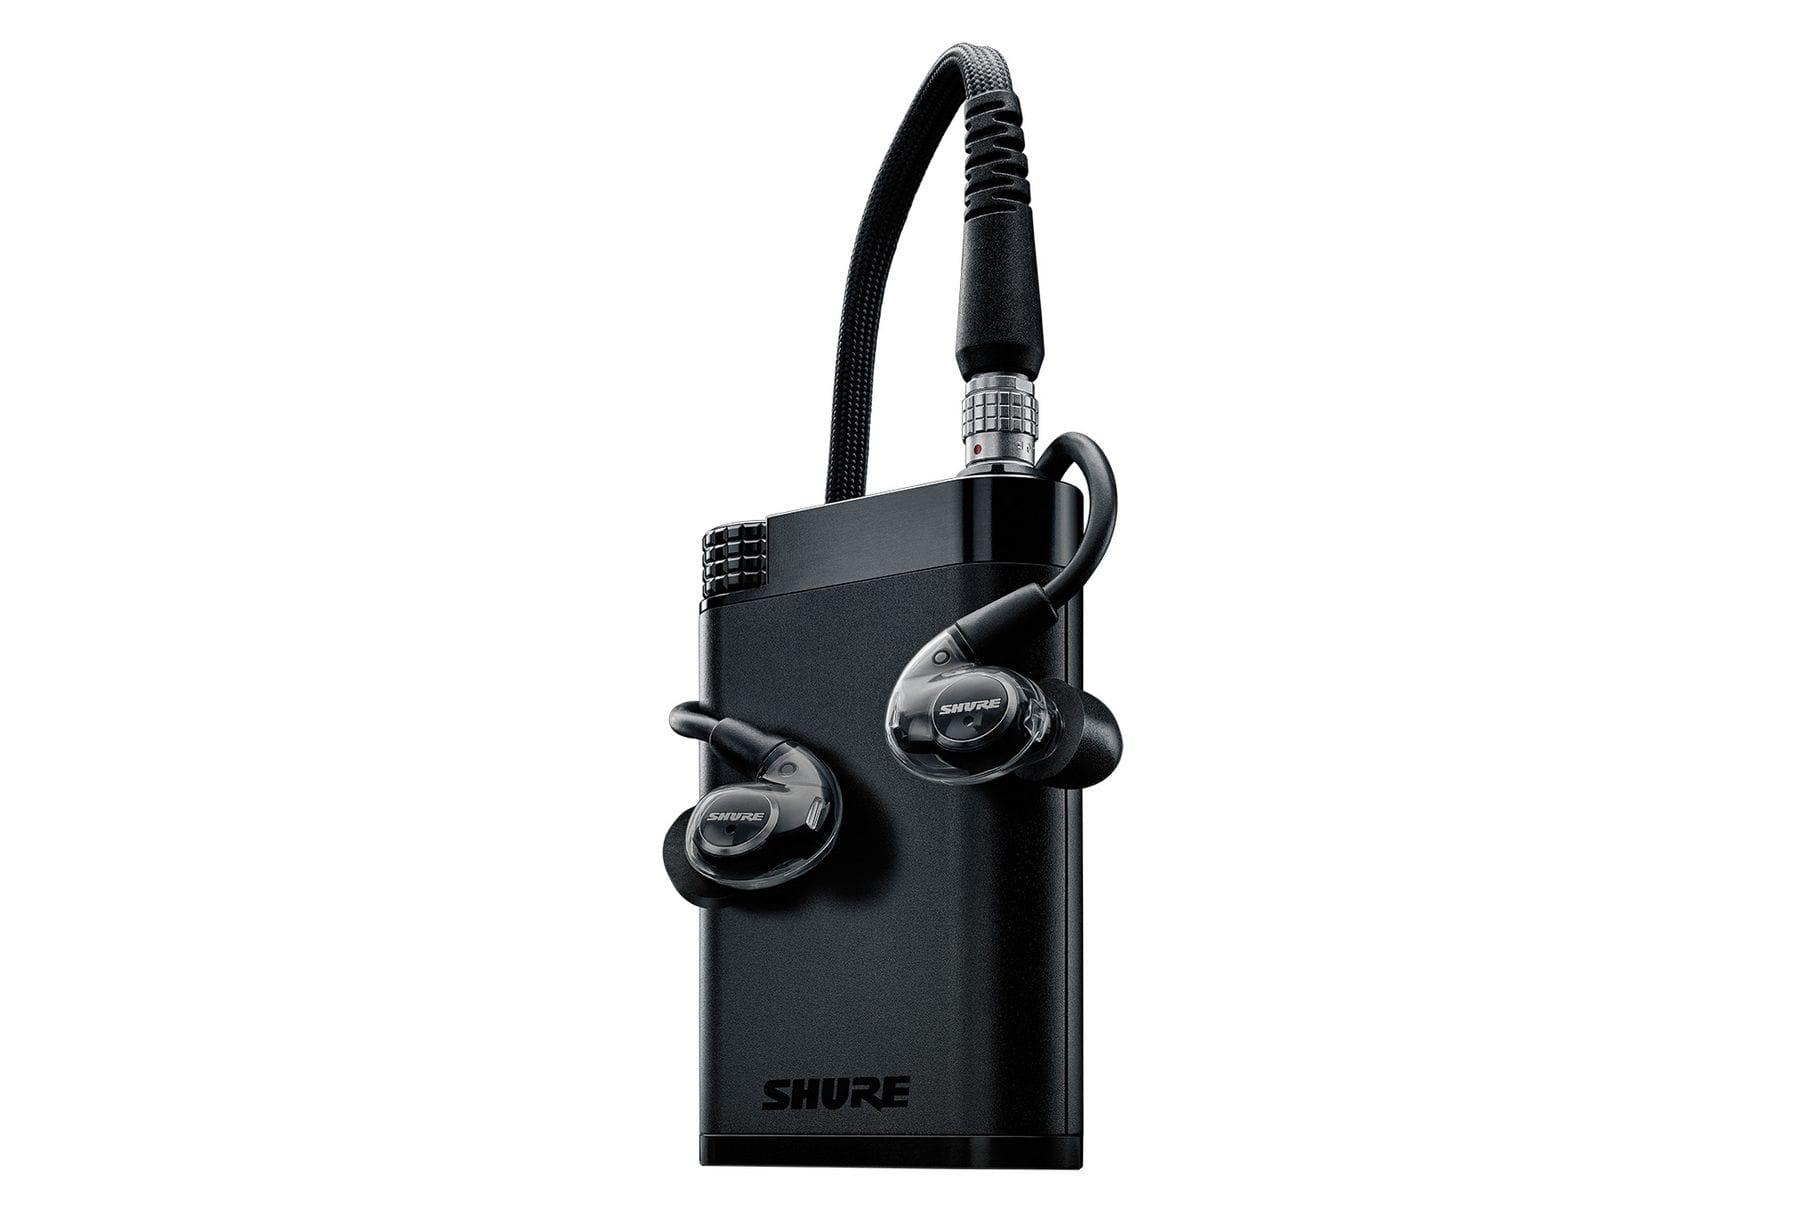 KSE1200 earphones